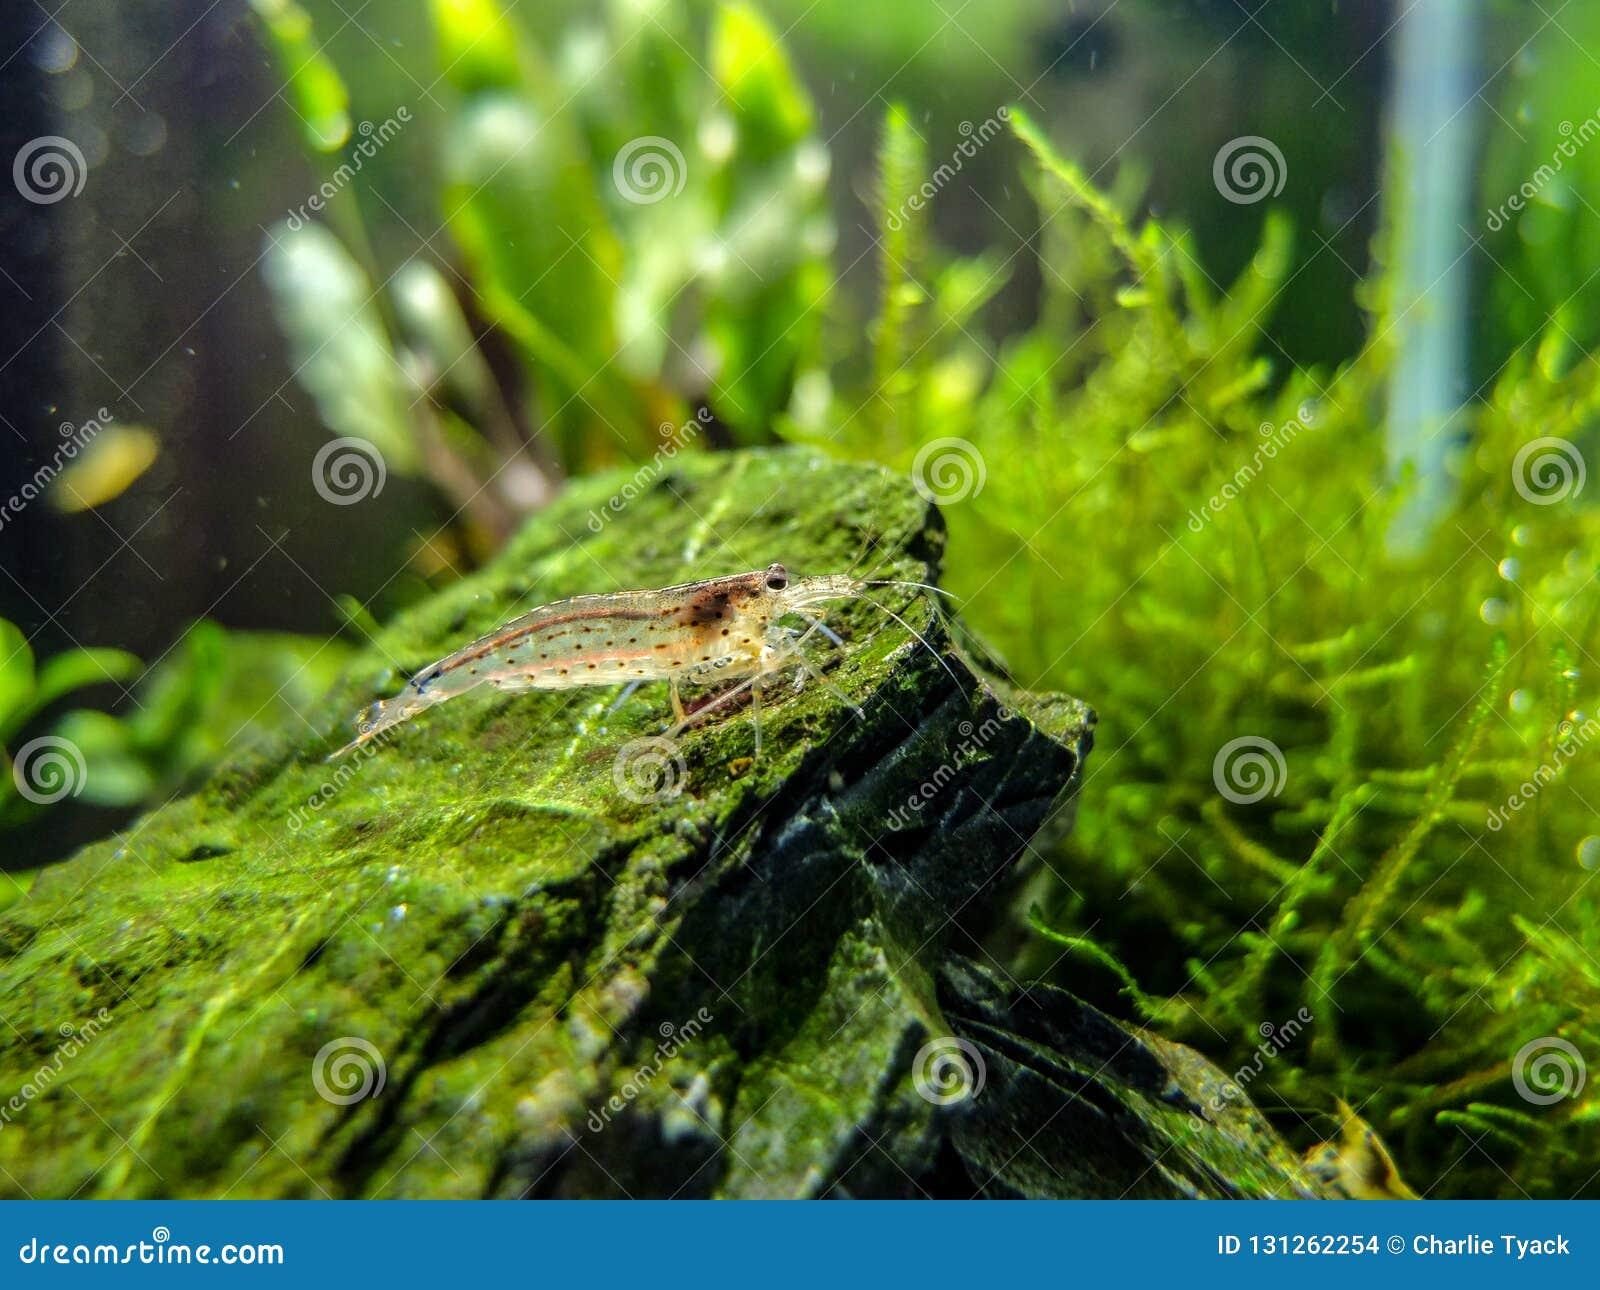 Amano shrimp in tropical nano freshwater tank